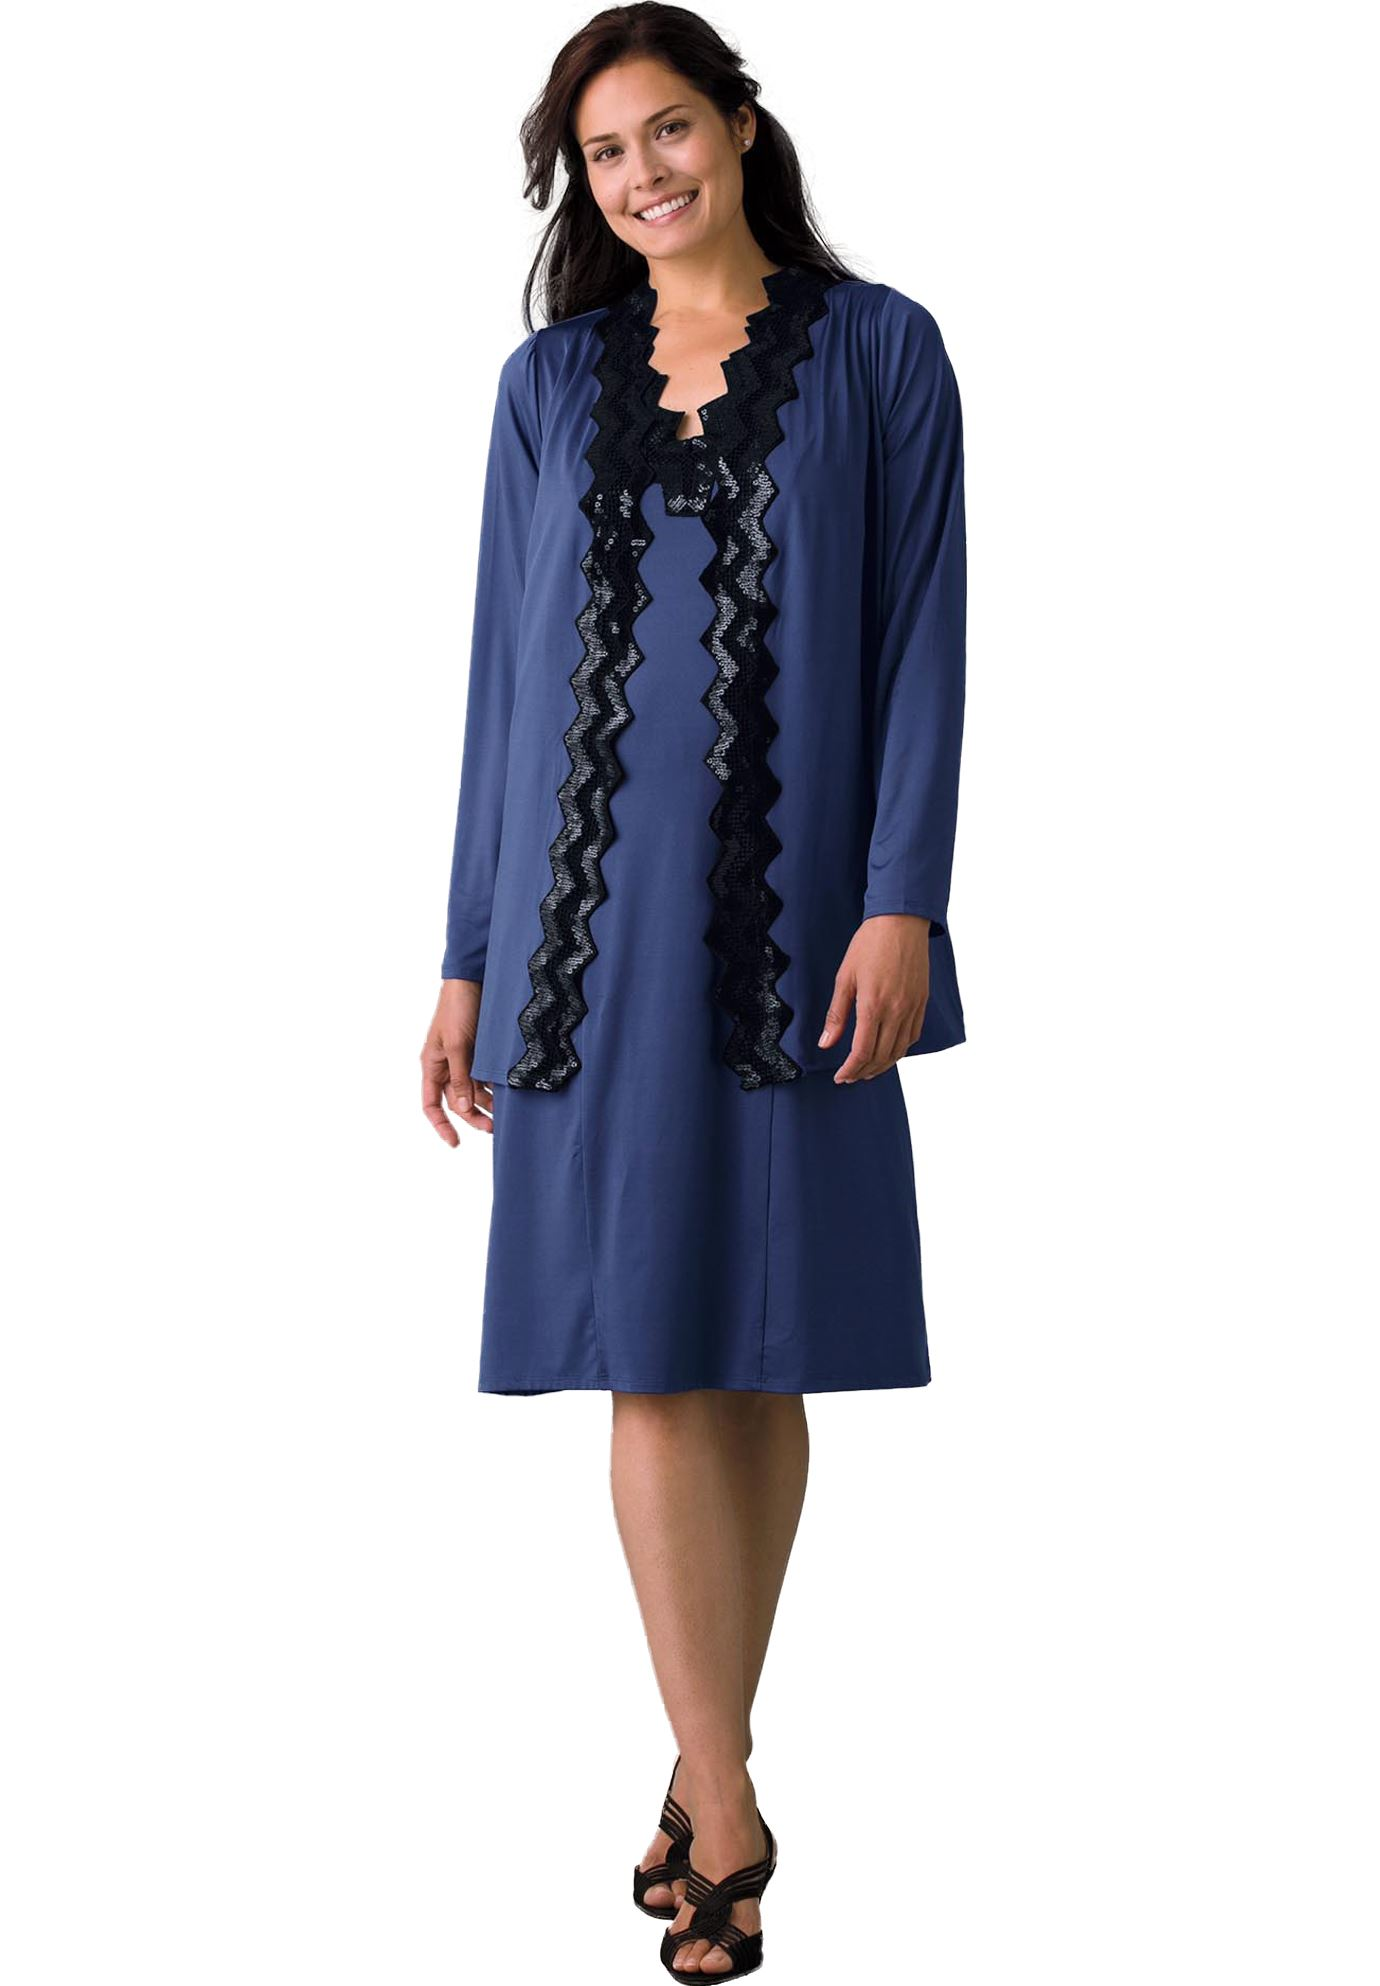 Plus Size Dress Blazers Better Choice 2017 Dresses Ask